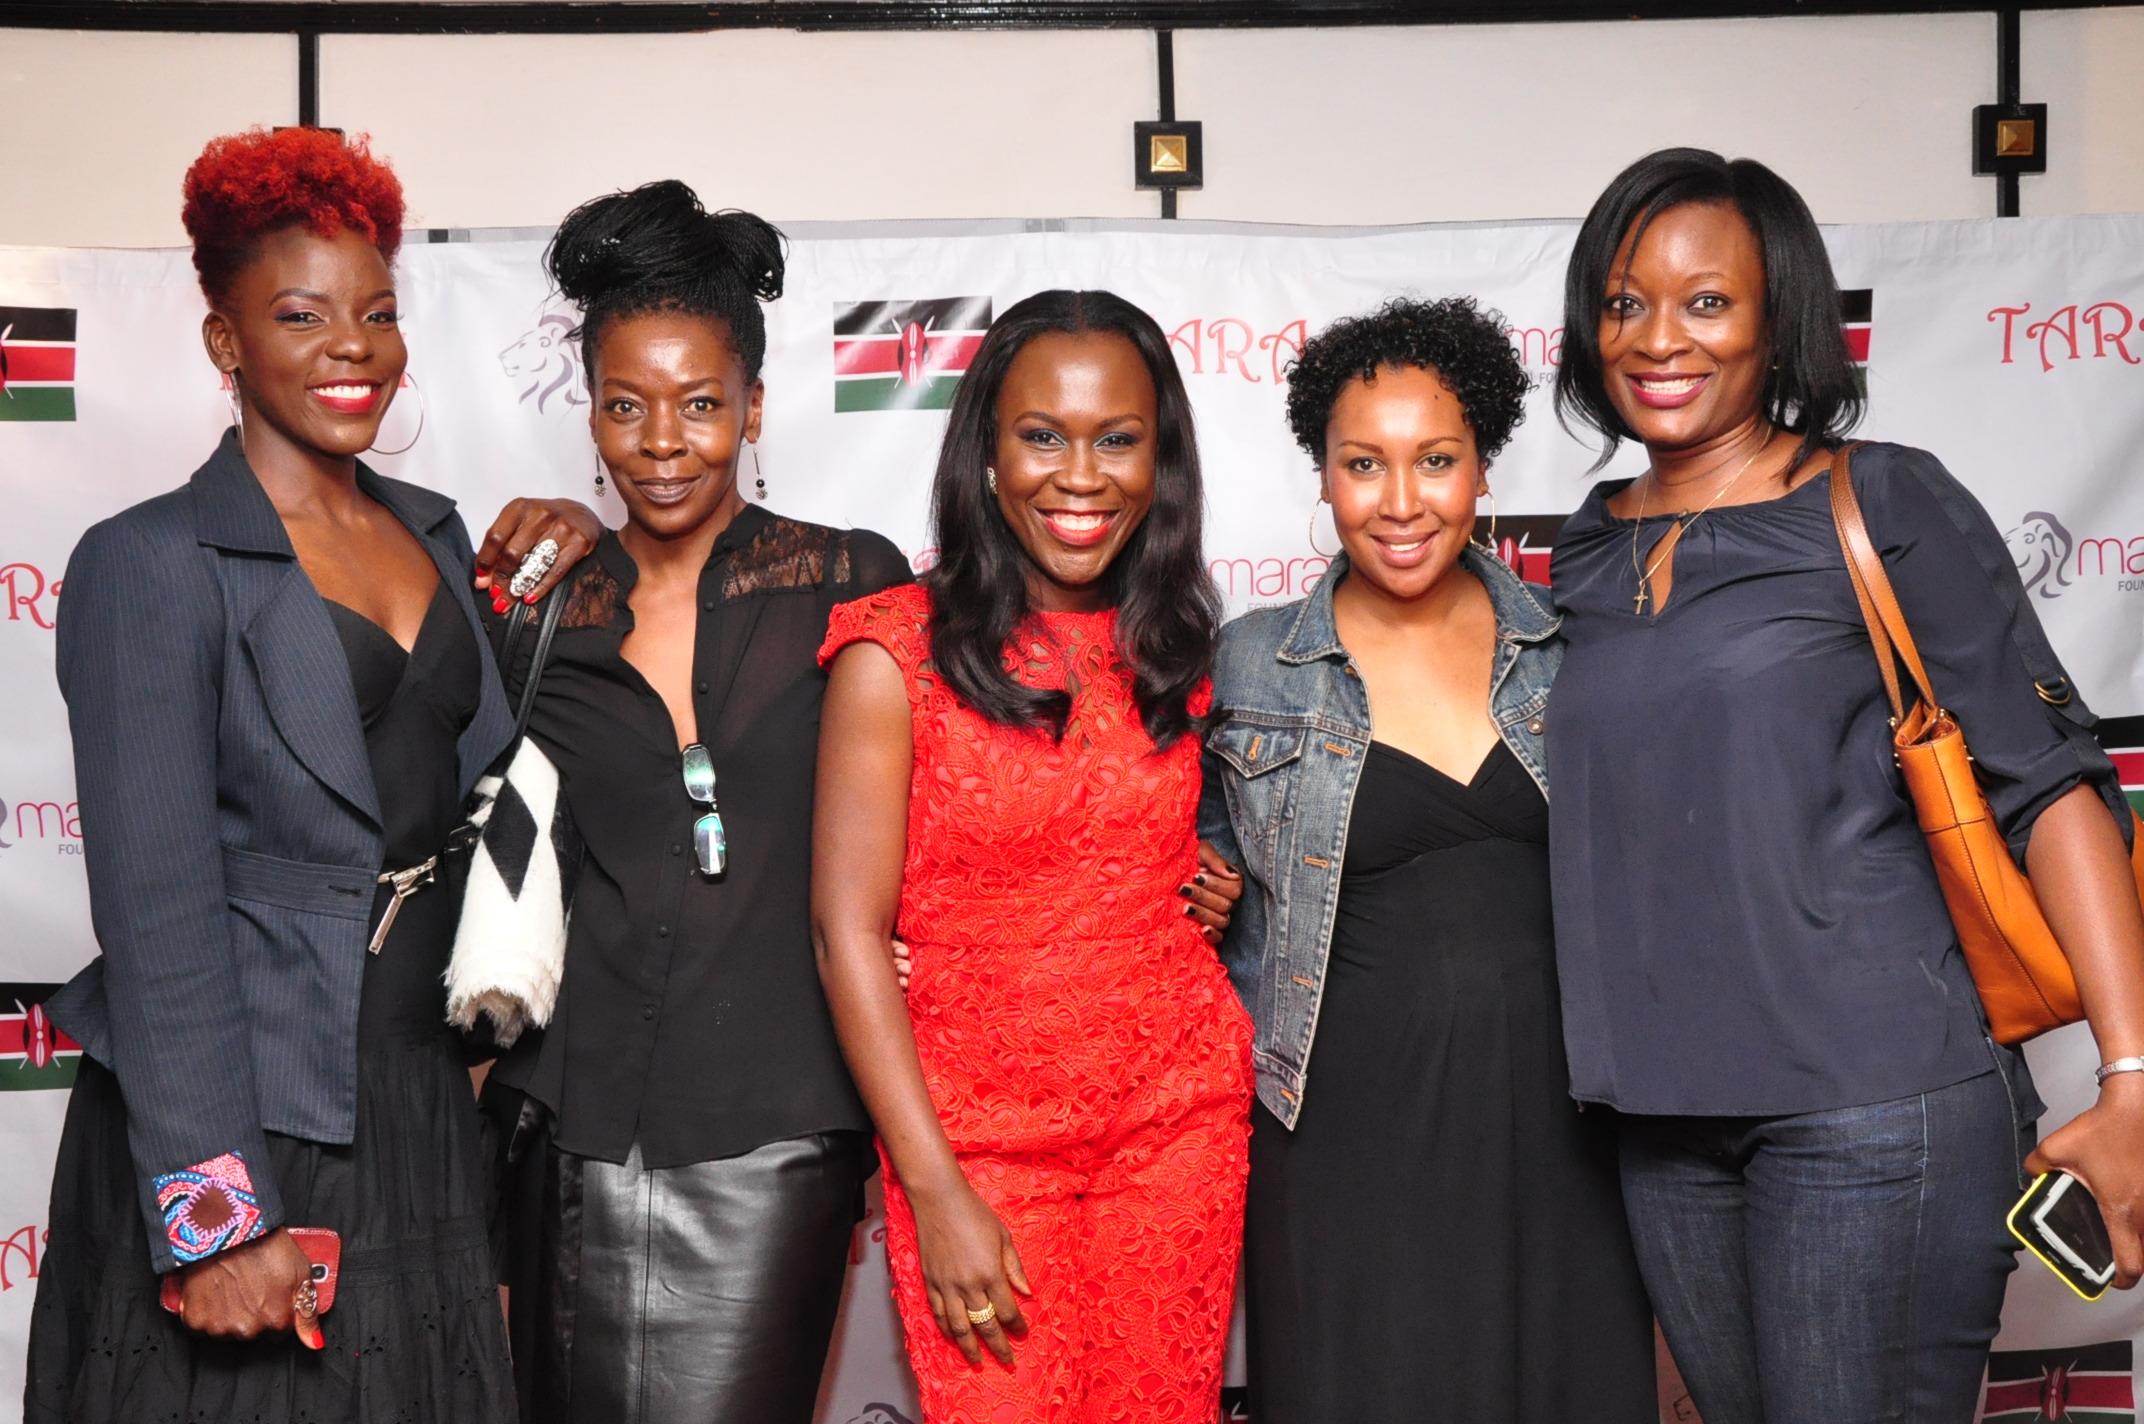 Tara  Fela-Durotoye  (centre) at the Kenyan launch of House of Tara